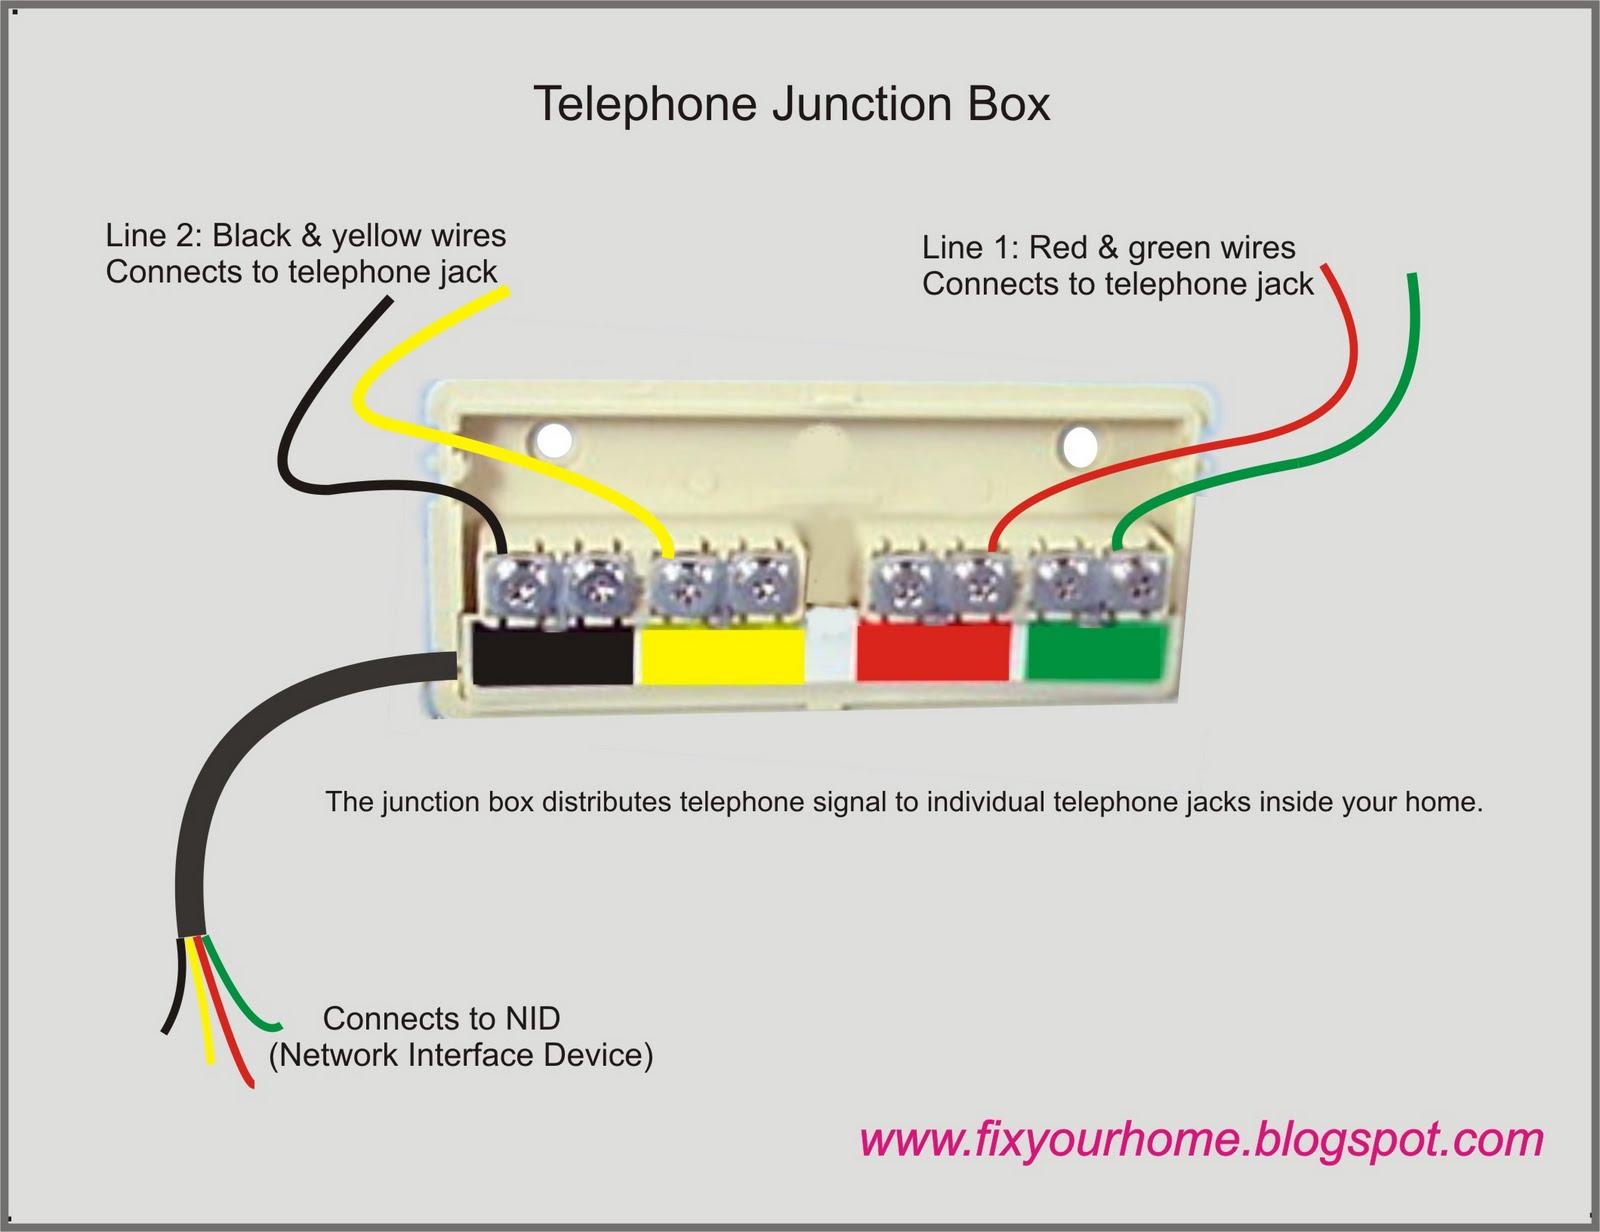 Home Phone Jack Wiring Diagram - 1999 Mustang Fuse Box Diagram for Wiring  Diagram Schematics | Telephone Jack Wiring Diagram |  | Wiring Diagram Schematics